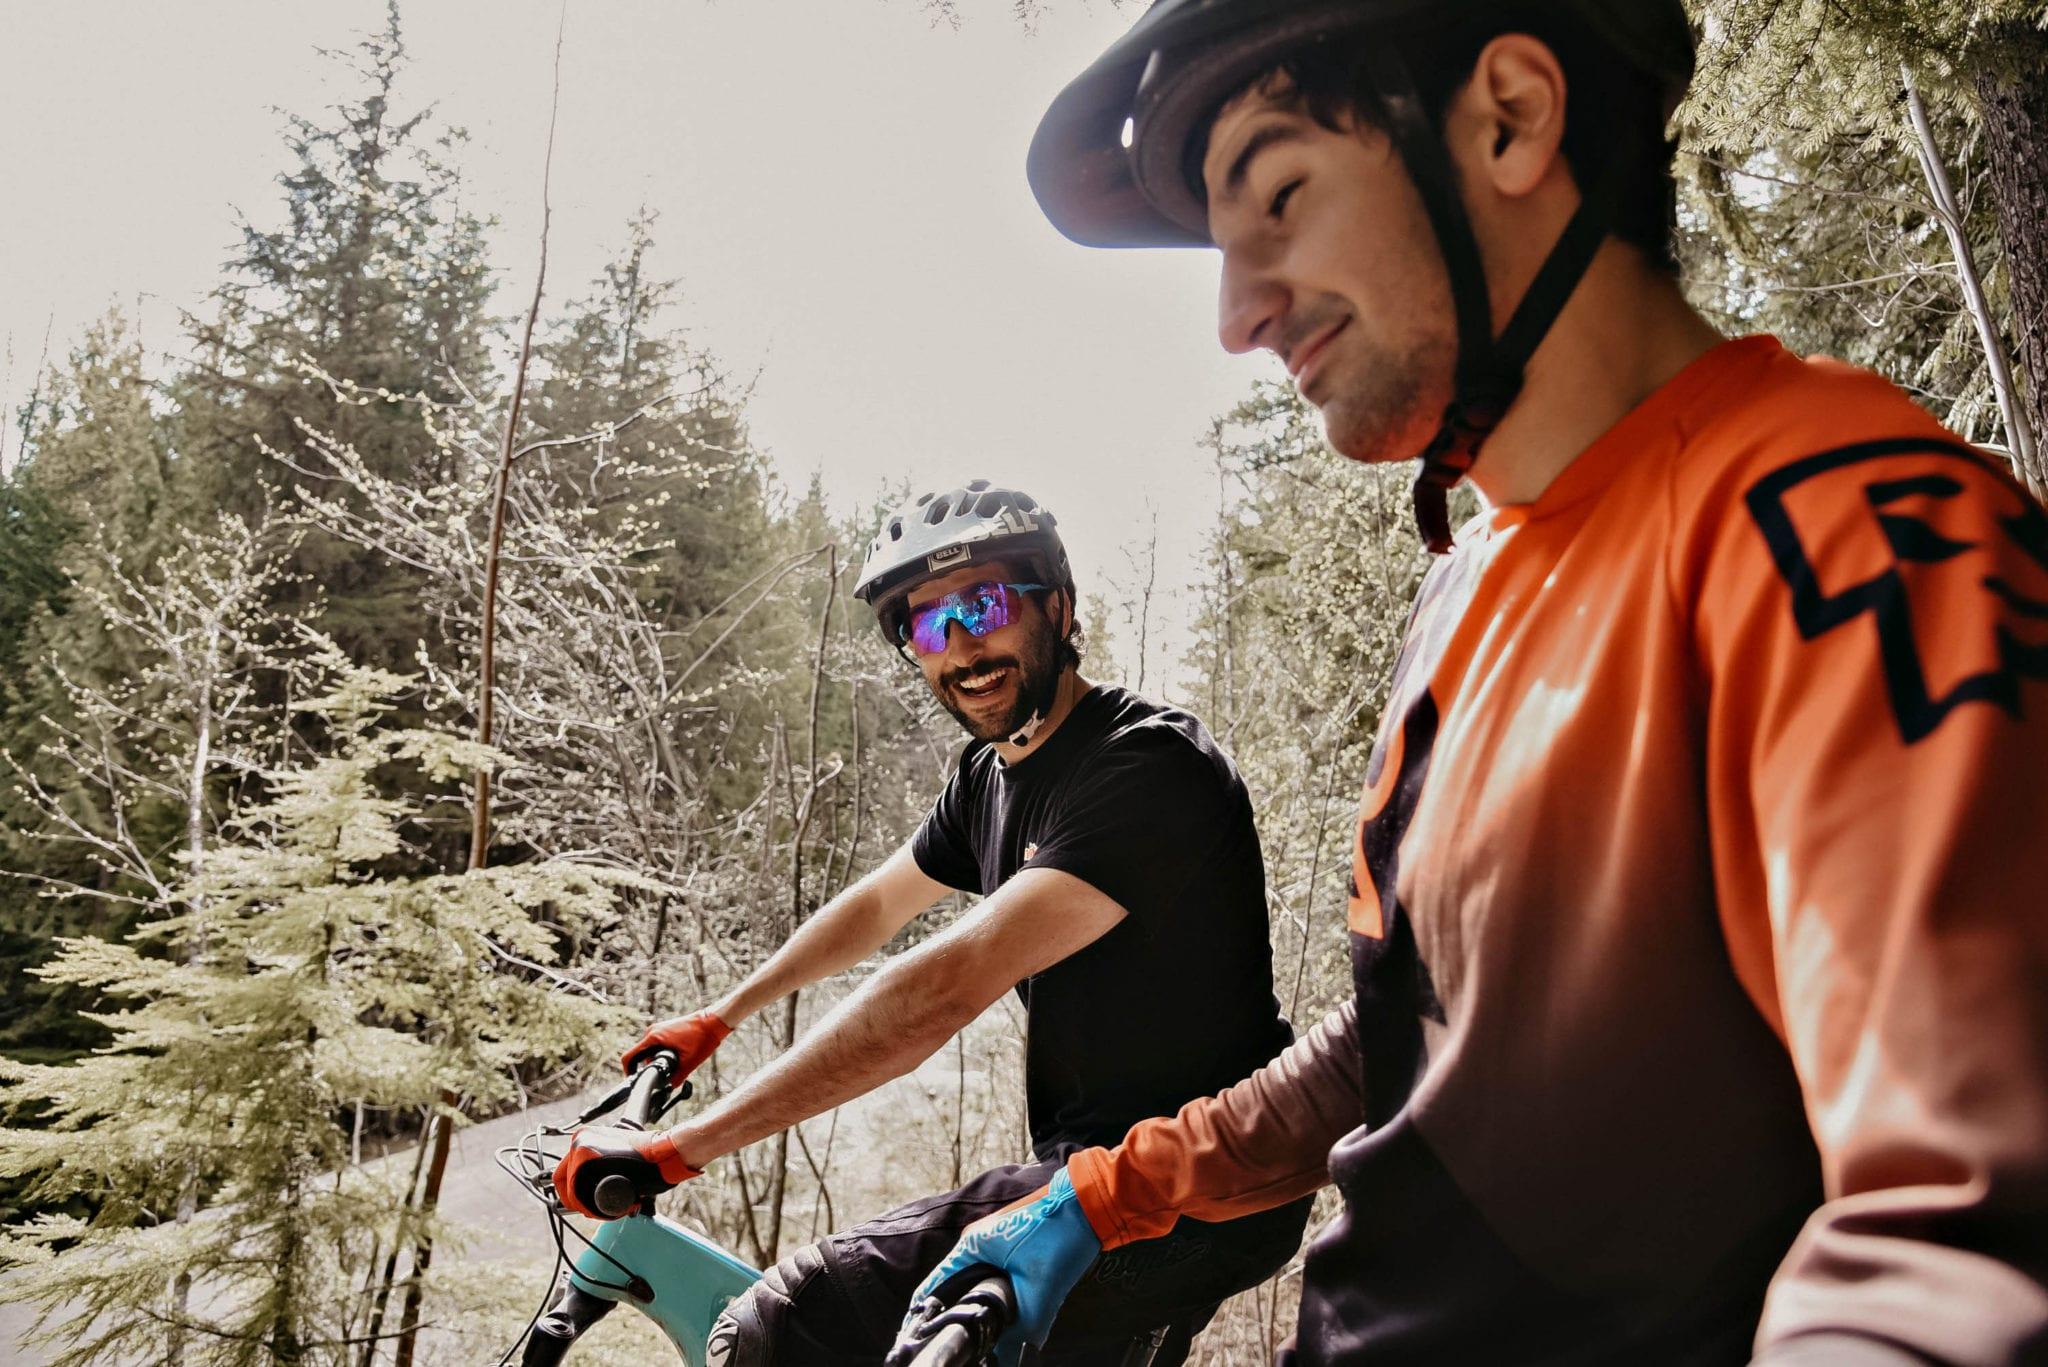 Cronometer staff mountain biking in Revelstoke, BC